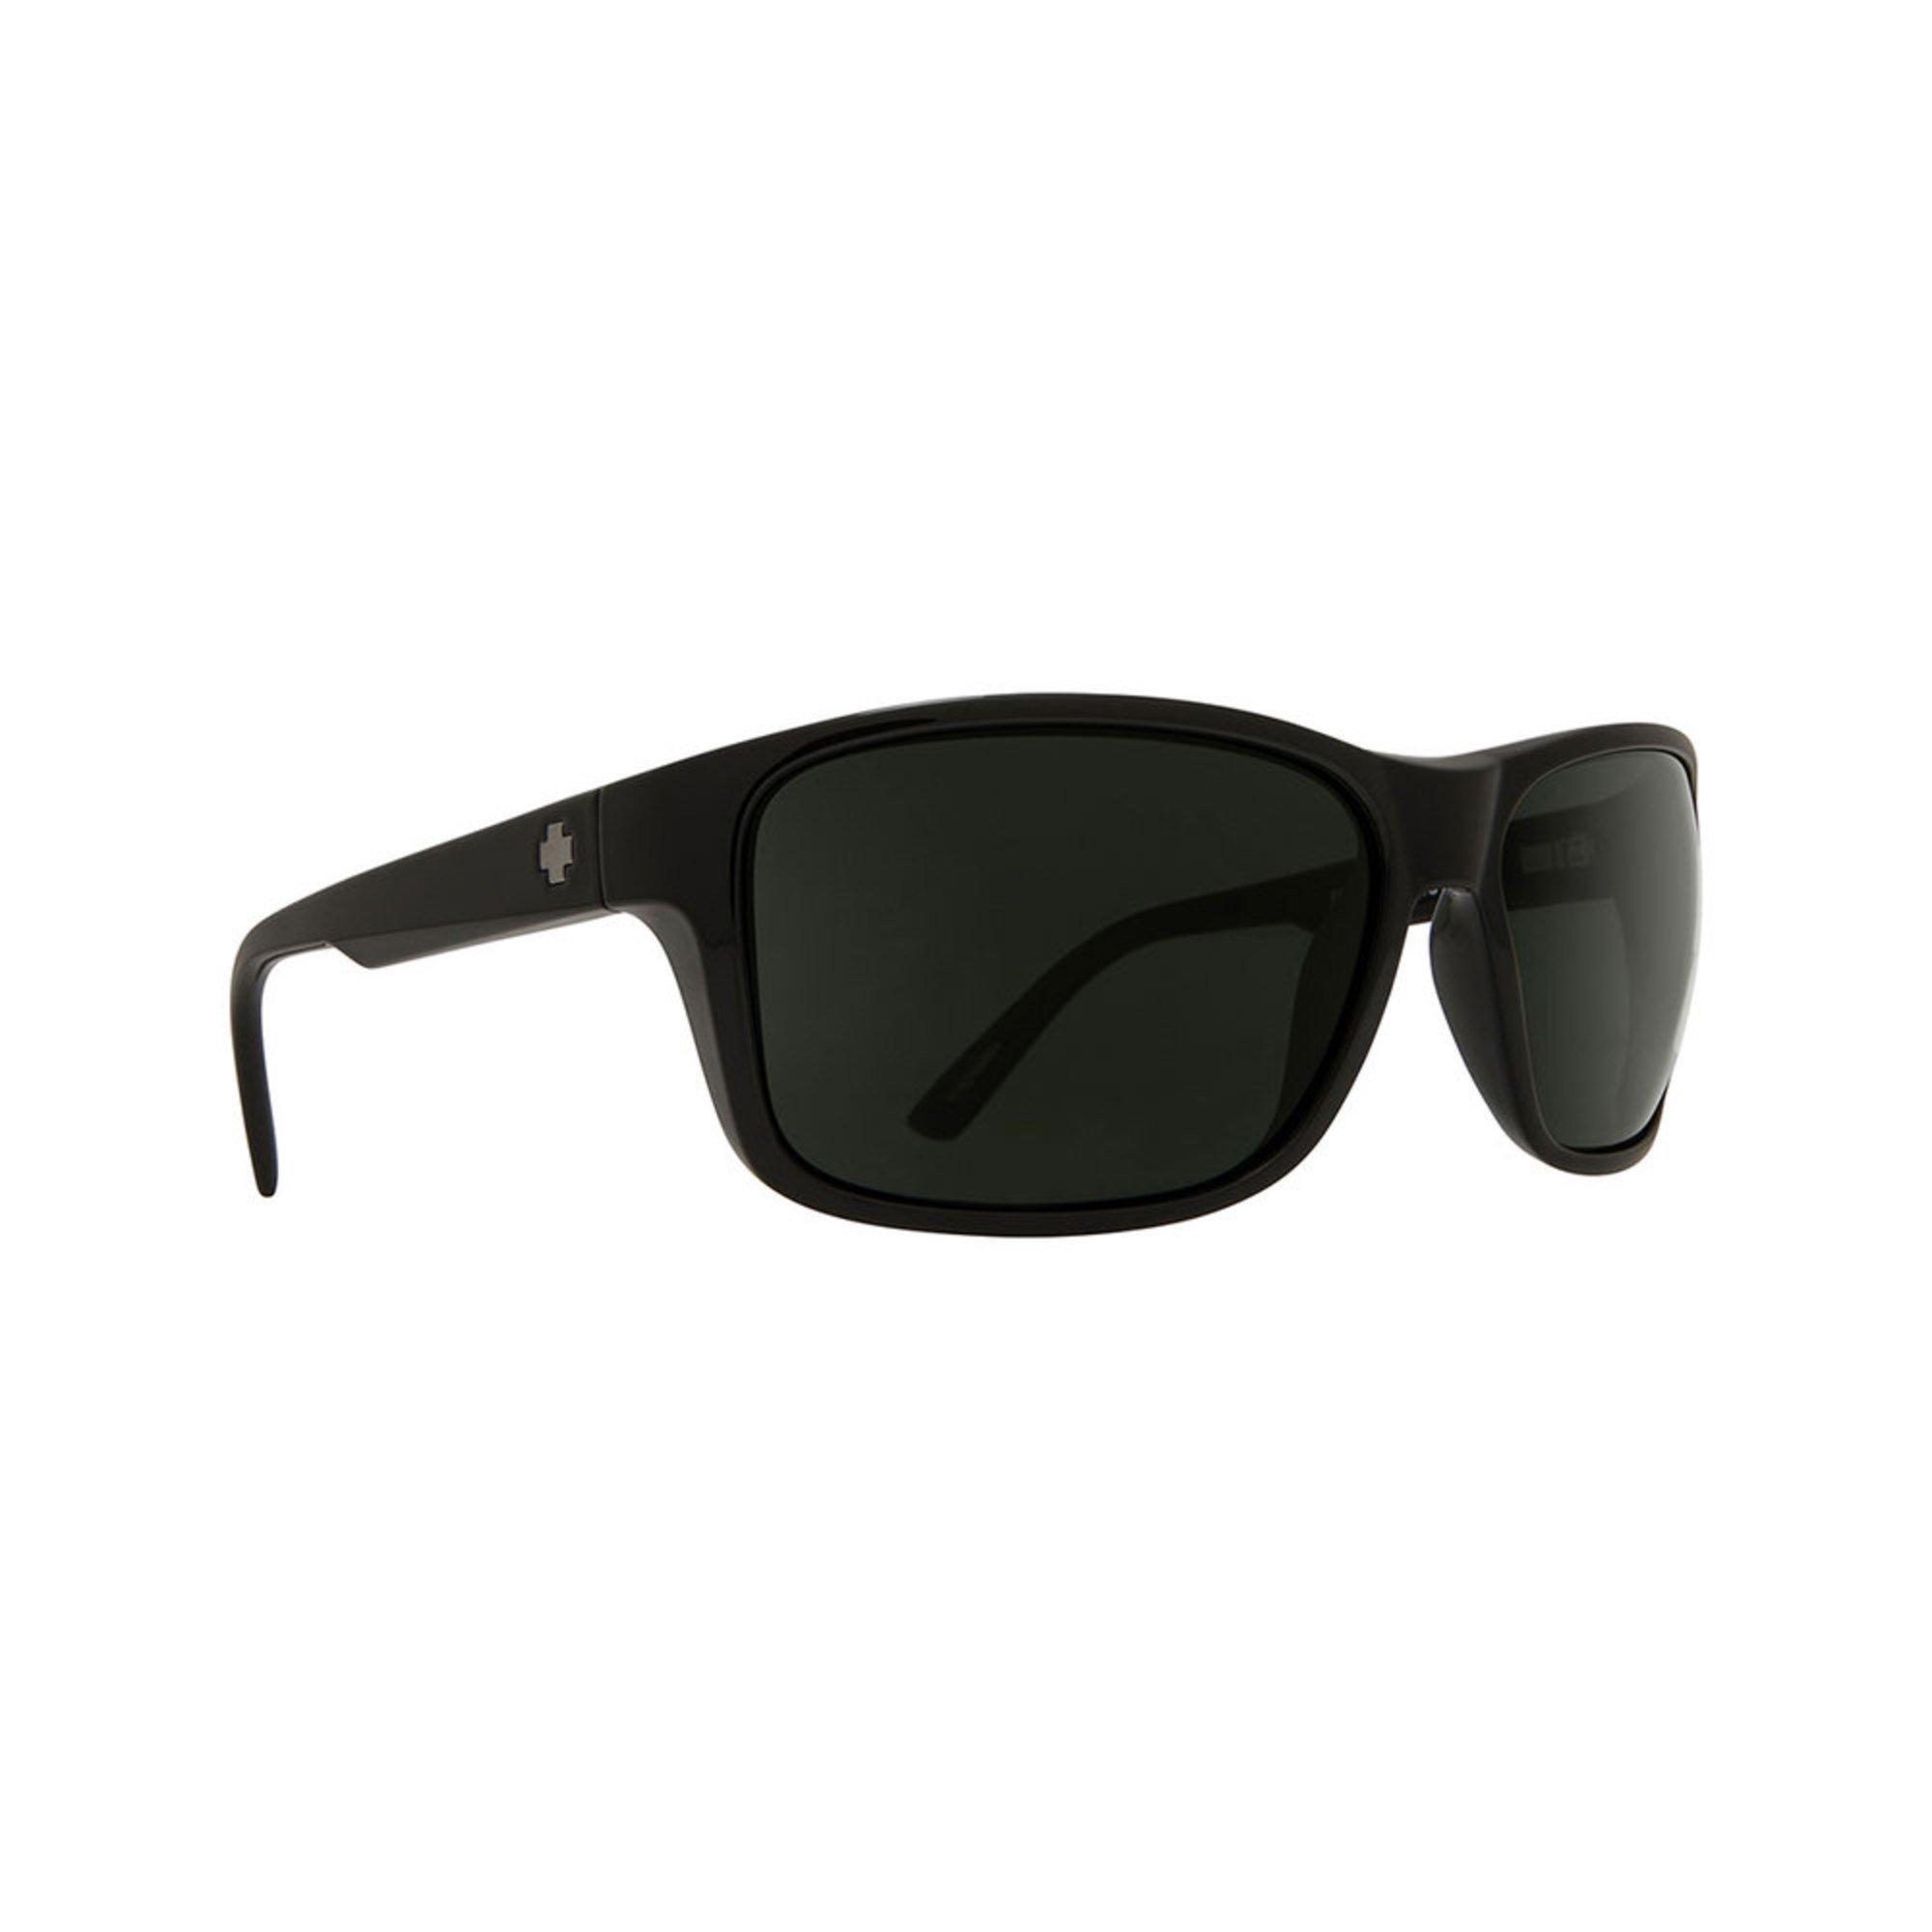 a0792cd4a0 Spy Optic. Spy Optic Men s Polarized Discord Square Sunglasses